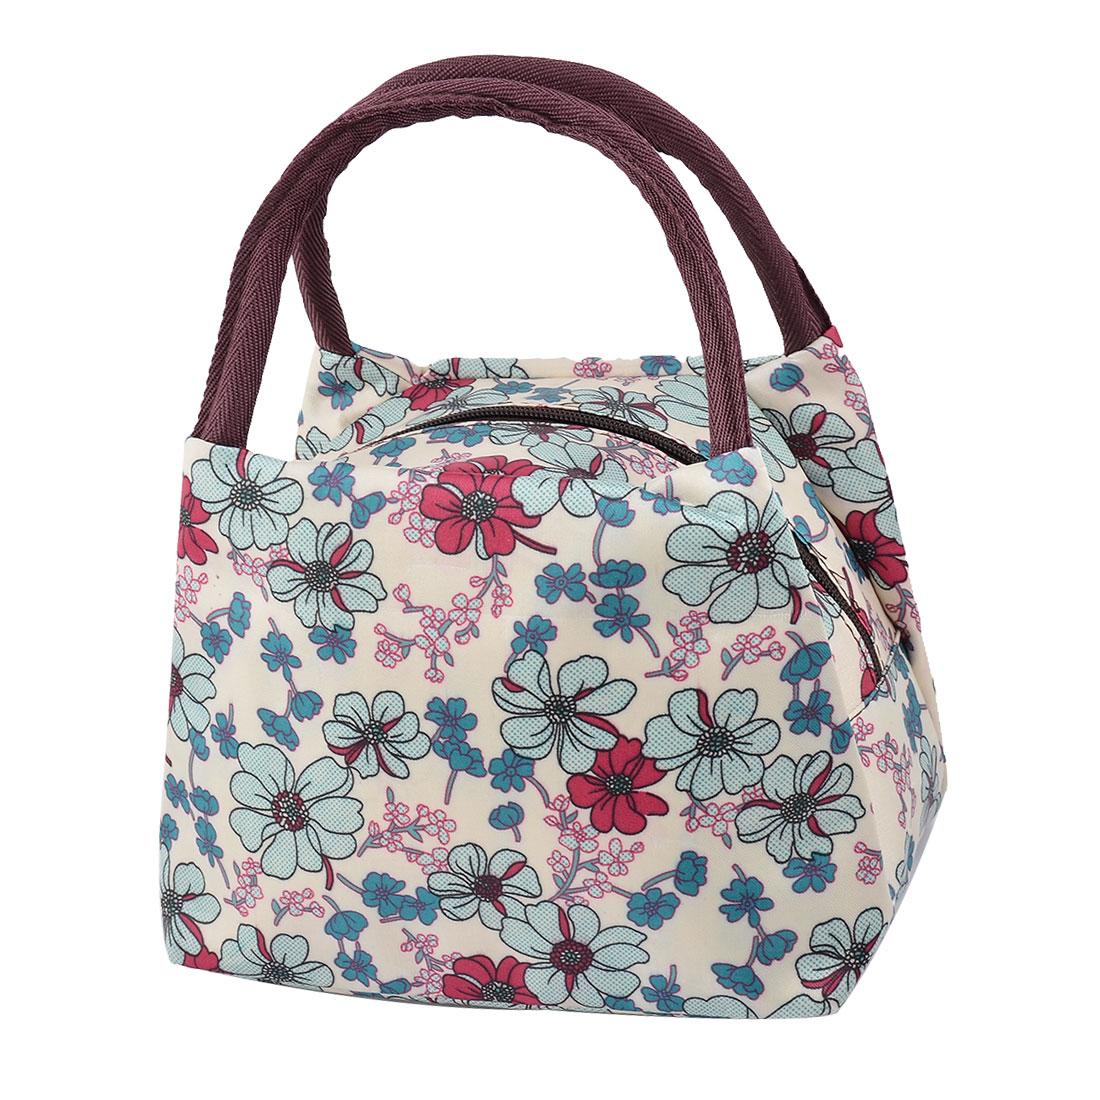 Outdoor Picnic Oxford Cloth Flower Pattern Lunch Holder Cooler Pouch Handbag Bag